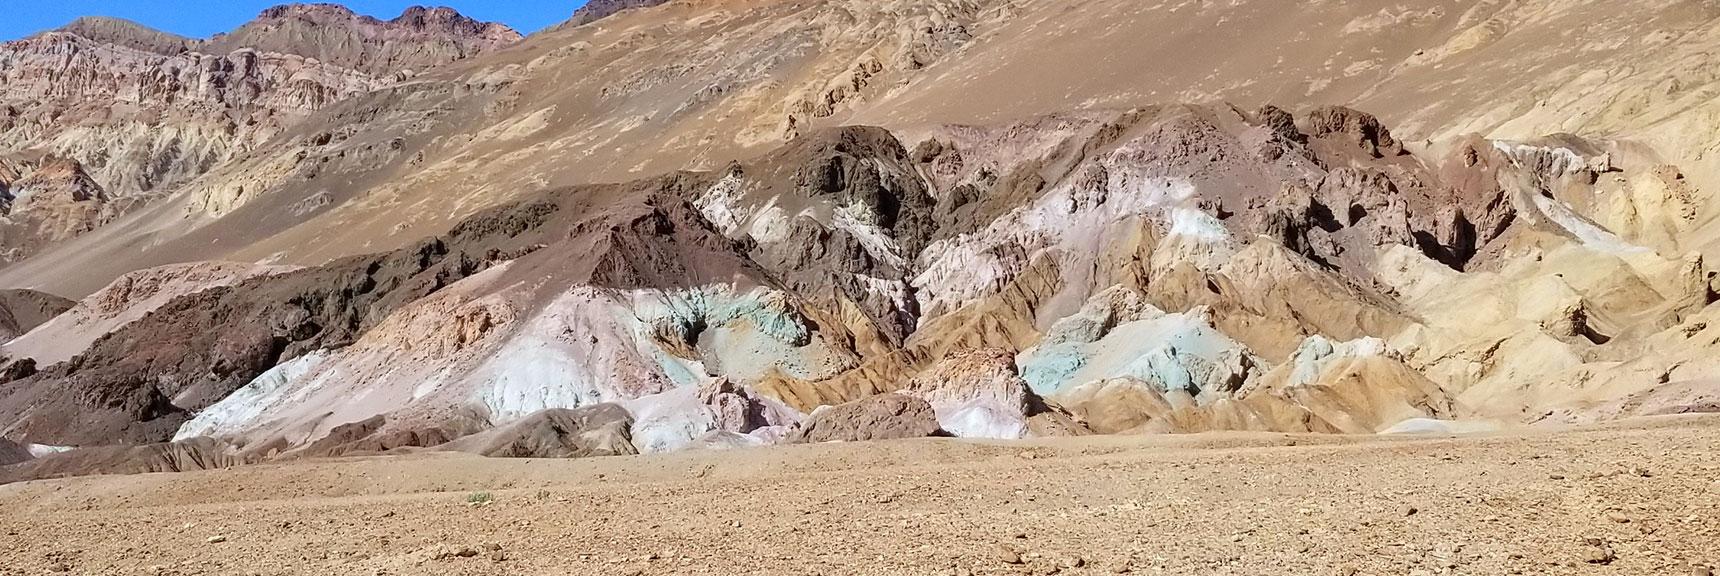 Artist's Drive Death Valley National Park, CA